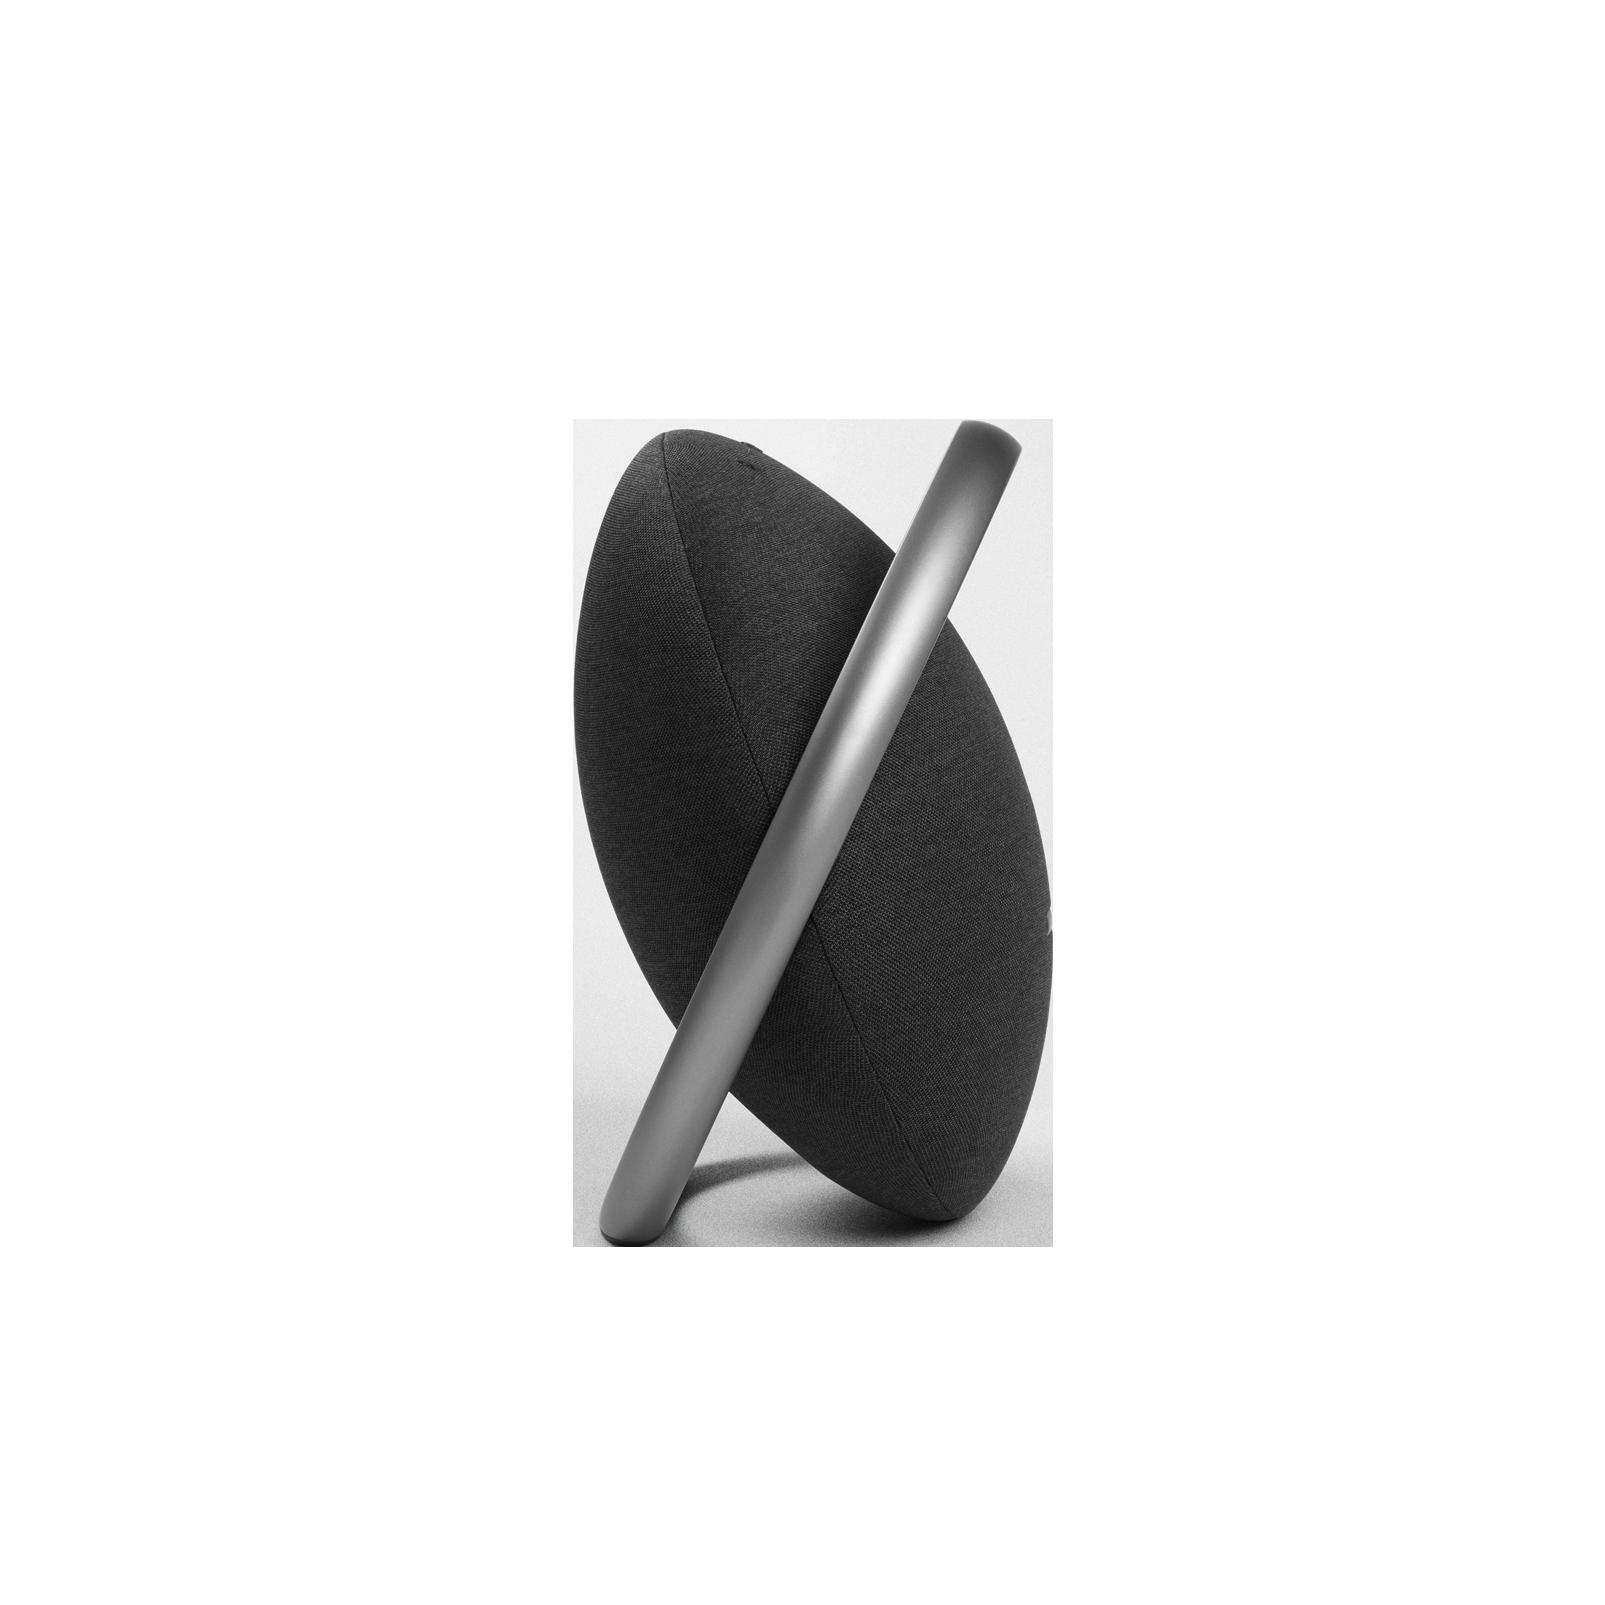 Onyx Studio 7 - Black - Portable Stereo Bluetooth Speaker - Right